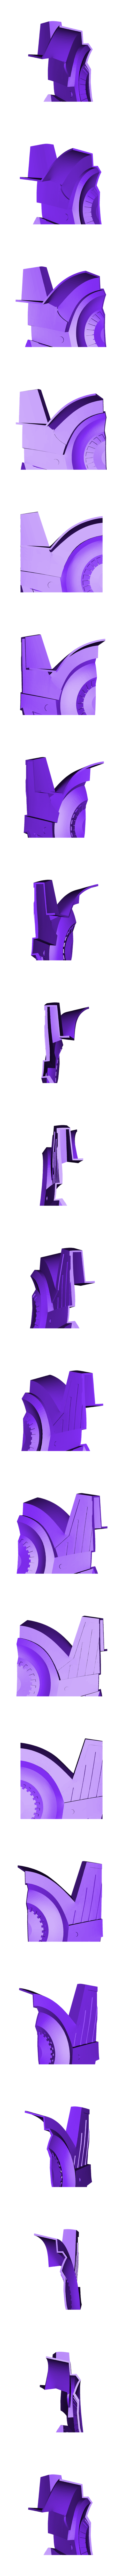 Part_12.stl Download free STL file Mass Effect N7 Breather Helmet • Template to 3D print, VillainousPropShop